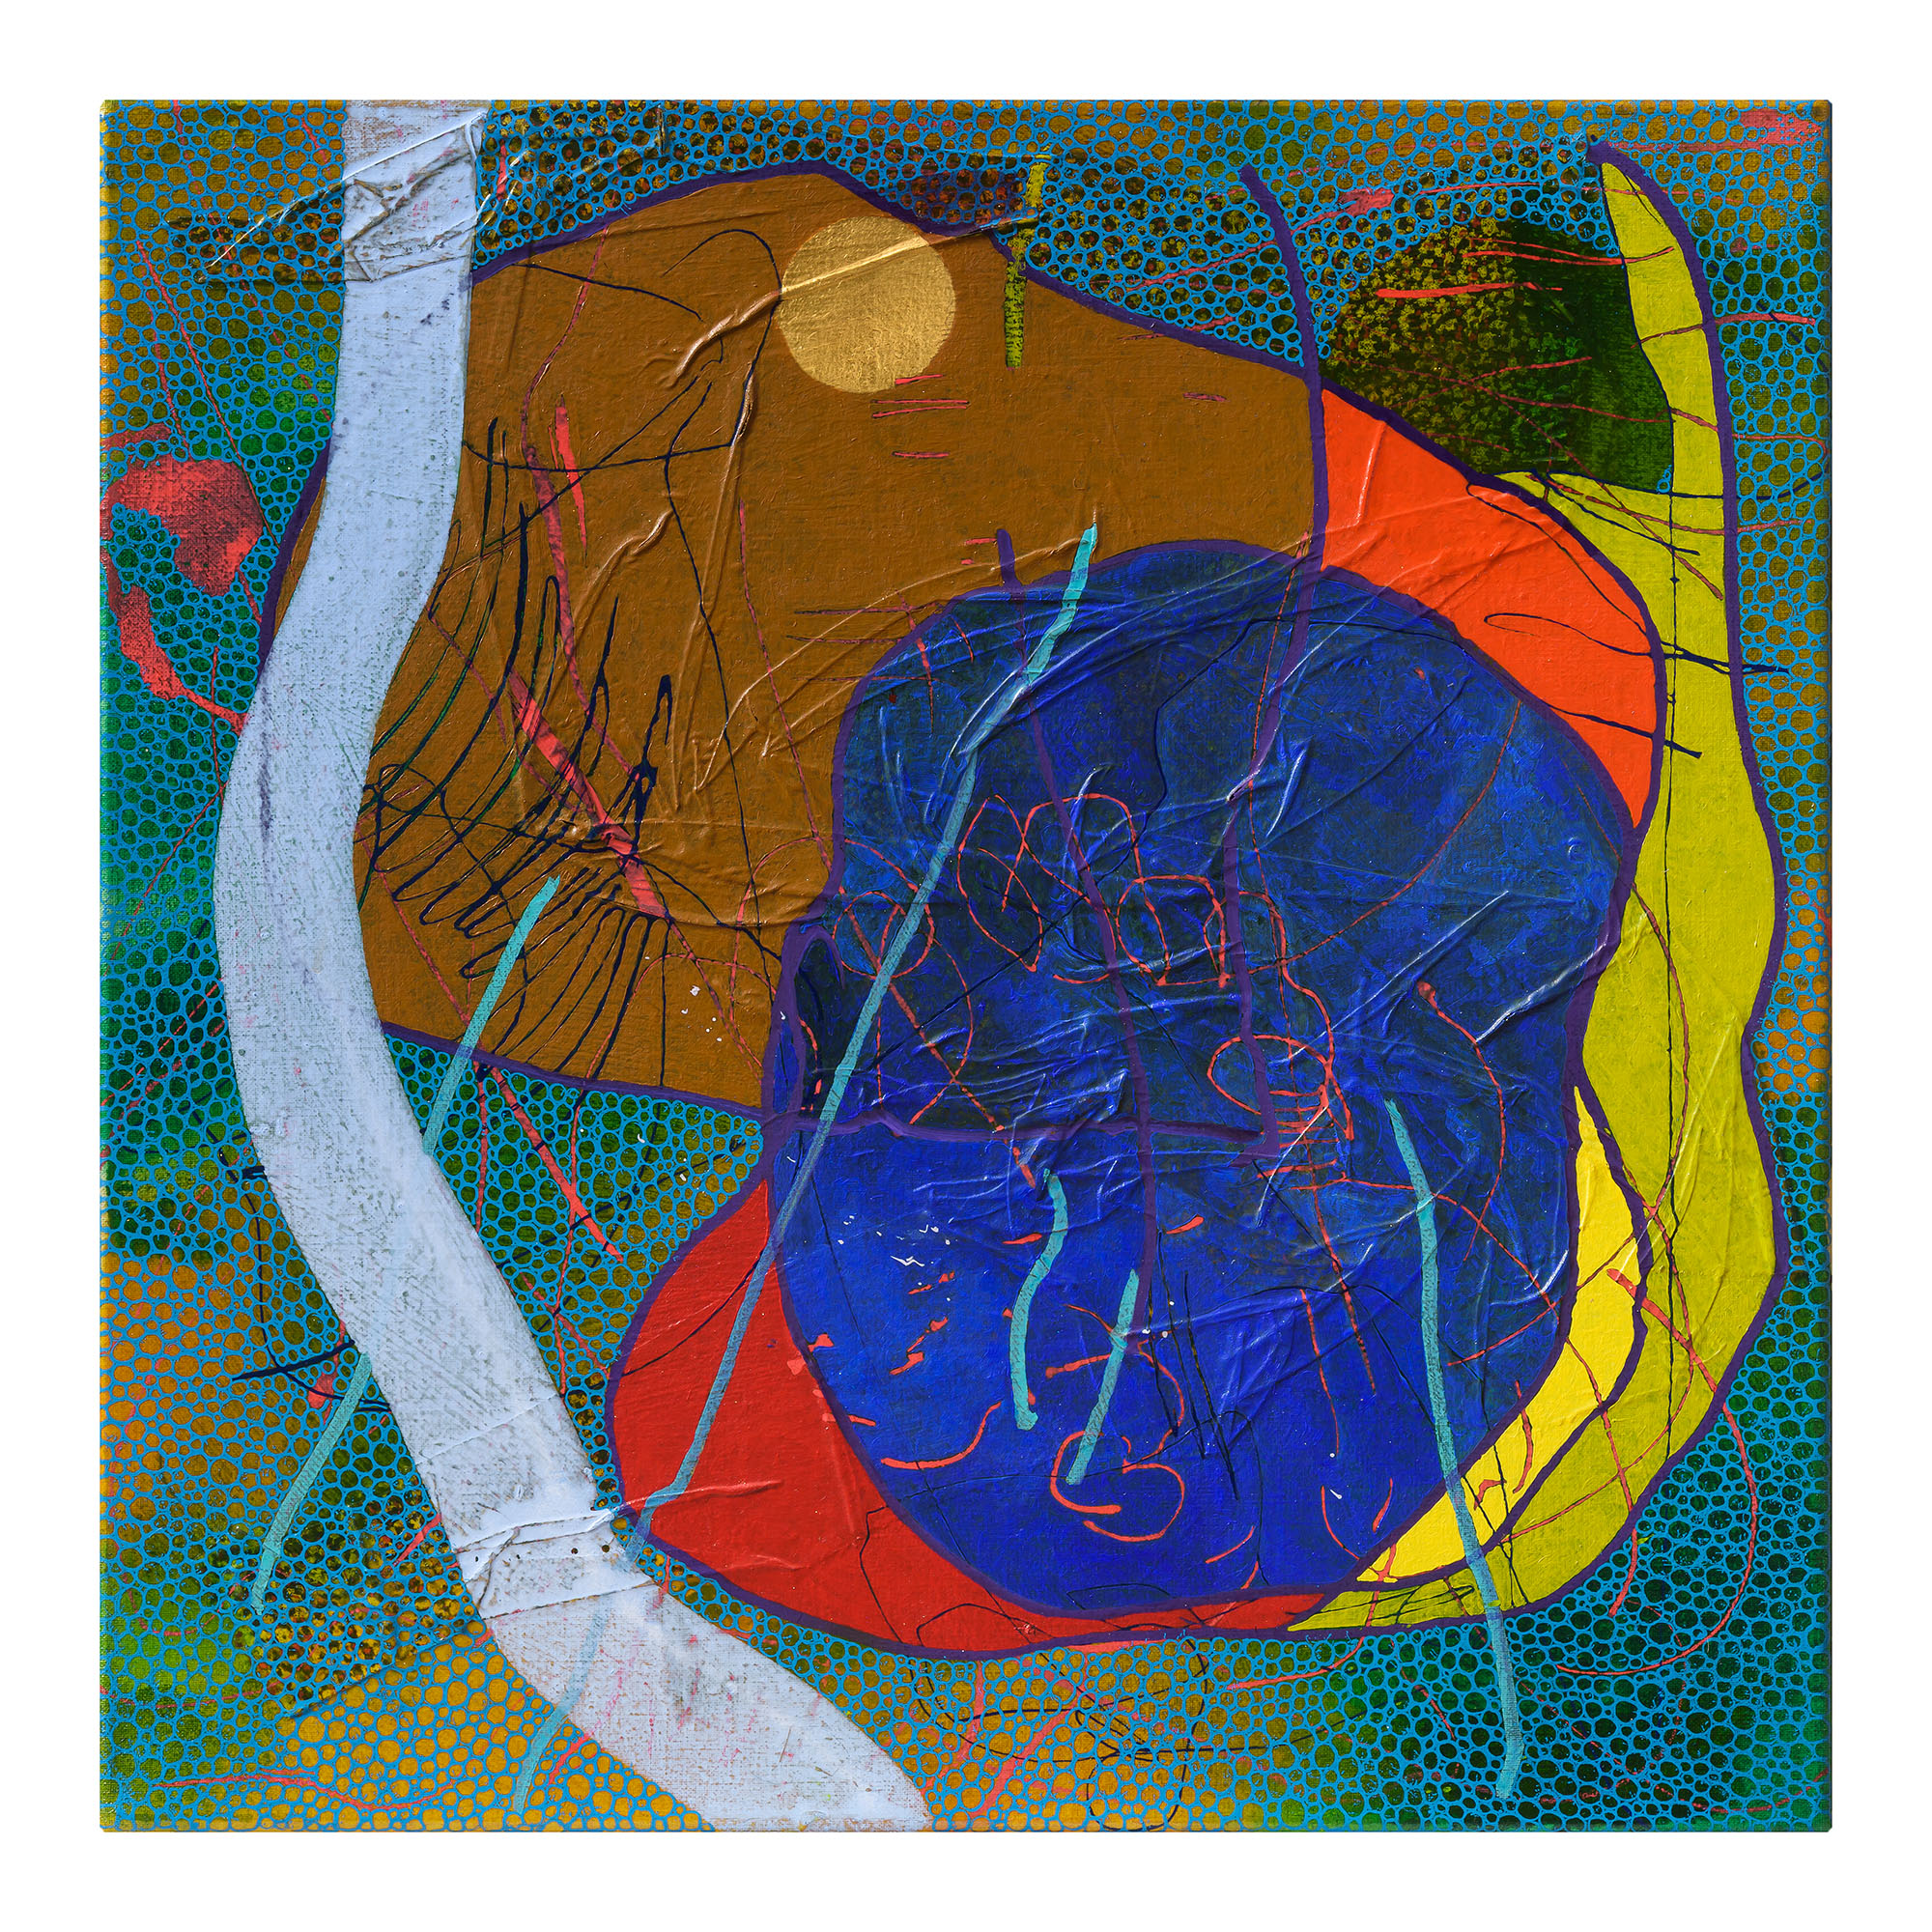 EVAN WOODRUFFE  10th January 2019  acrylic, fabric, gold leaf & mica on linen 50 × 50 cm